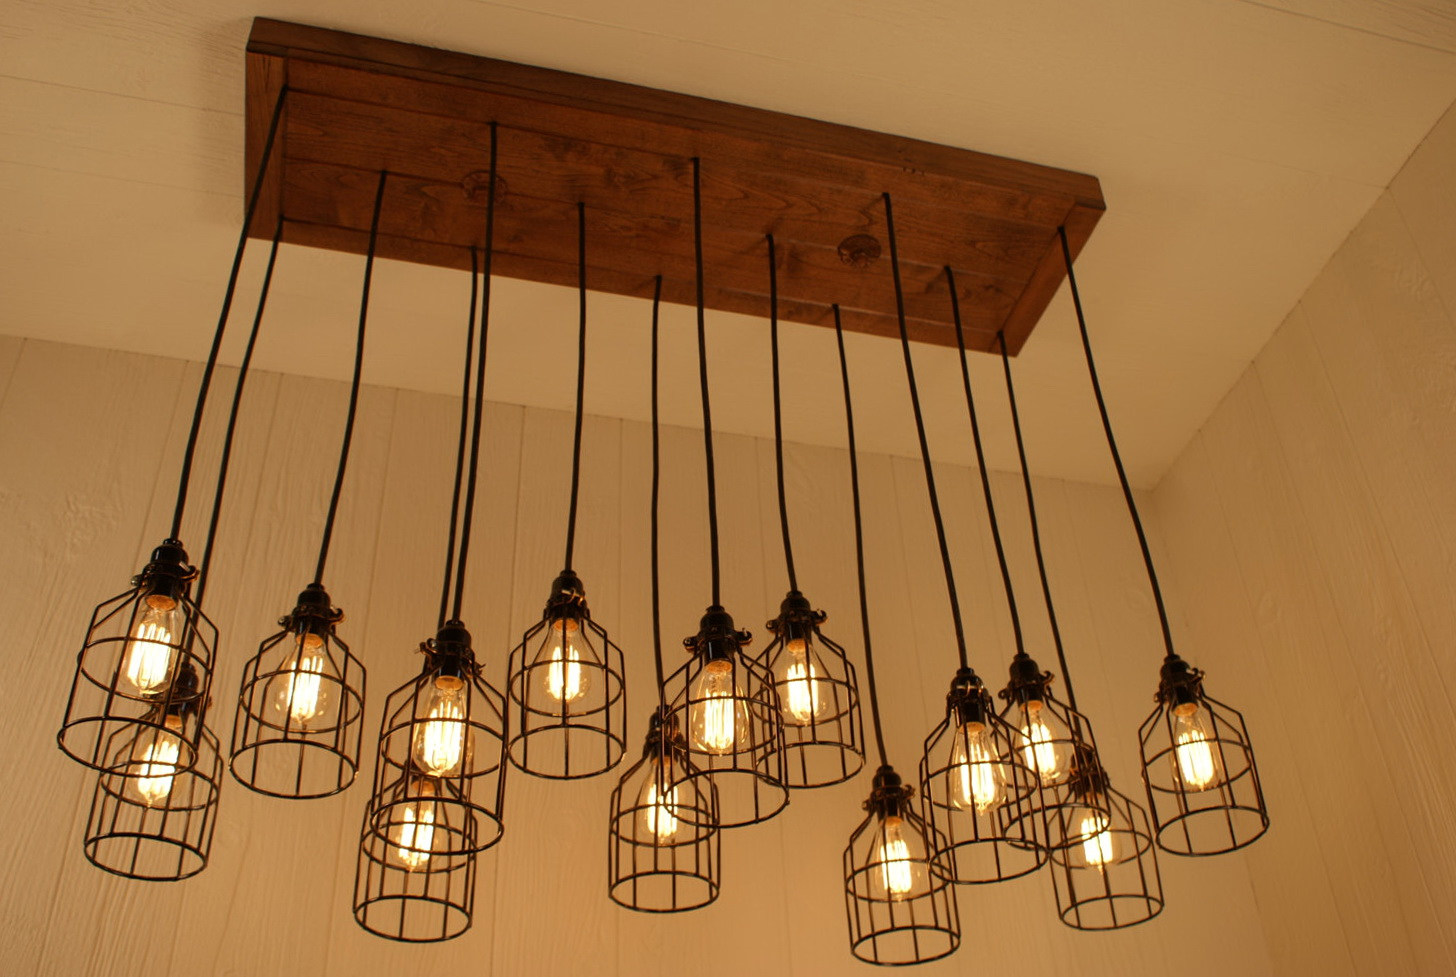 Diy edison light bulb chandelier home design ideas diy edison light bulb chandelier arubaitofo Image collections